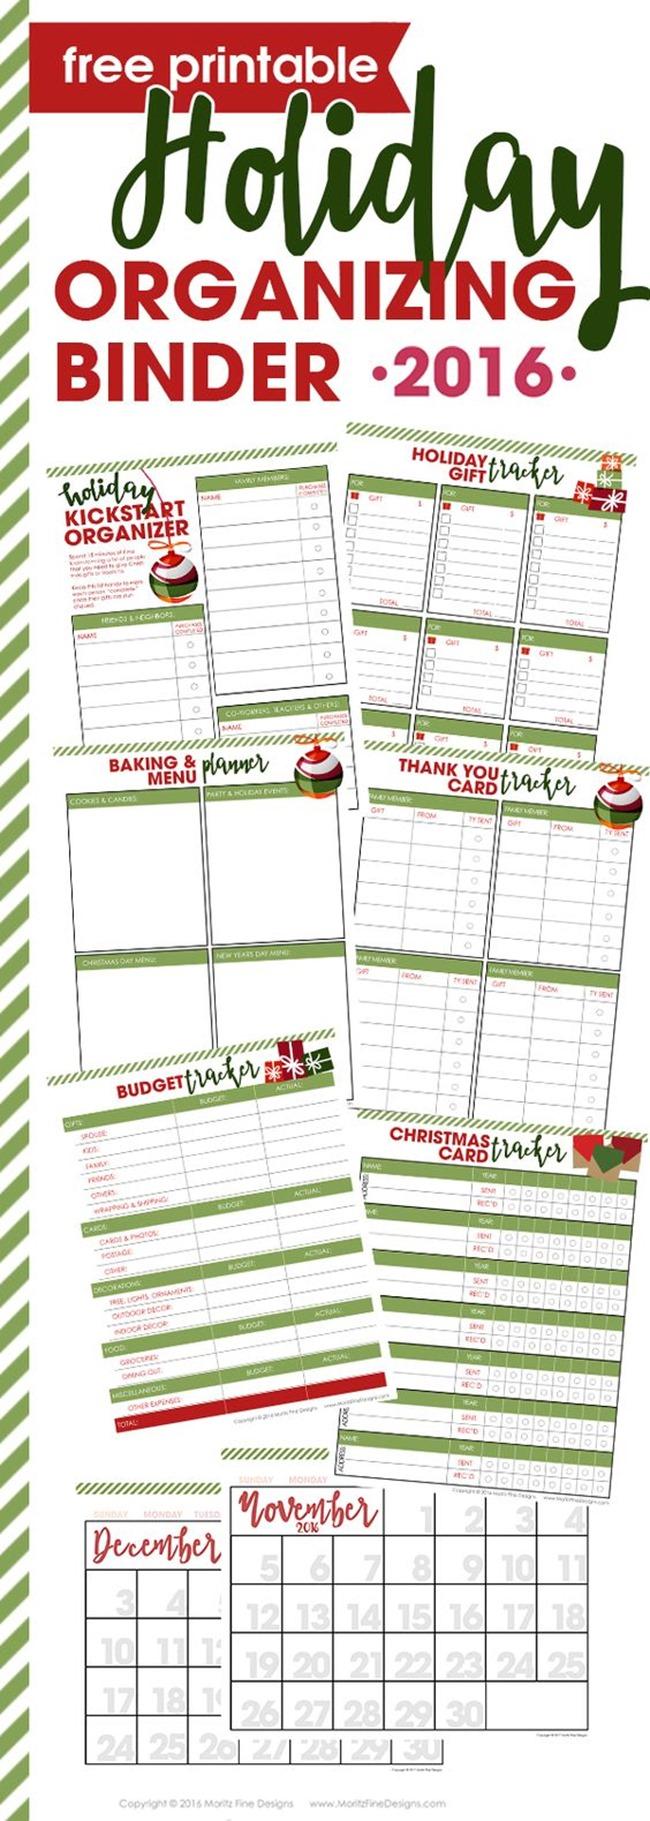 Free Christmas Planner Printable - Organization Binder